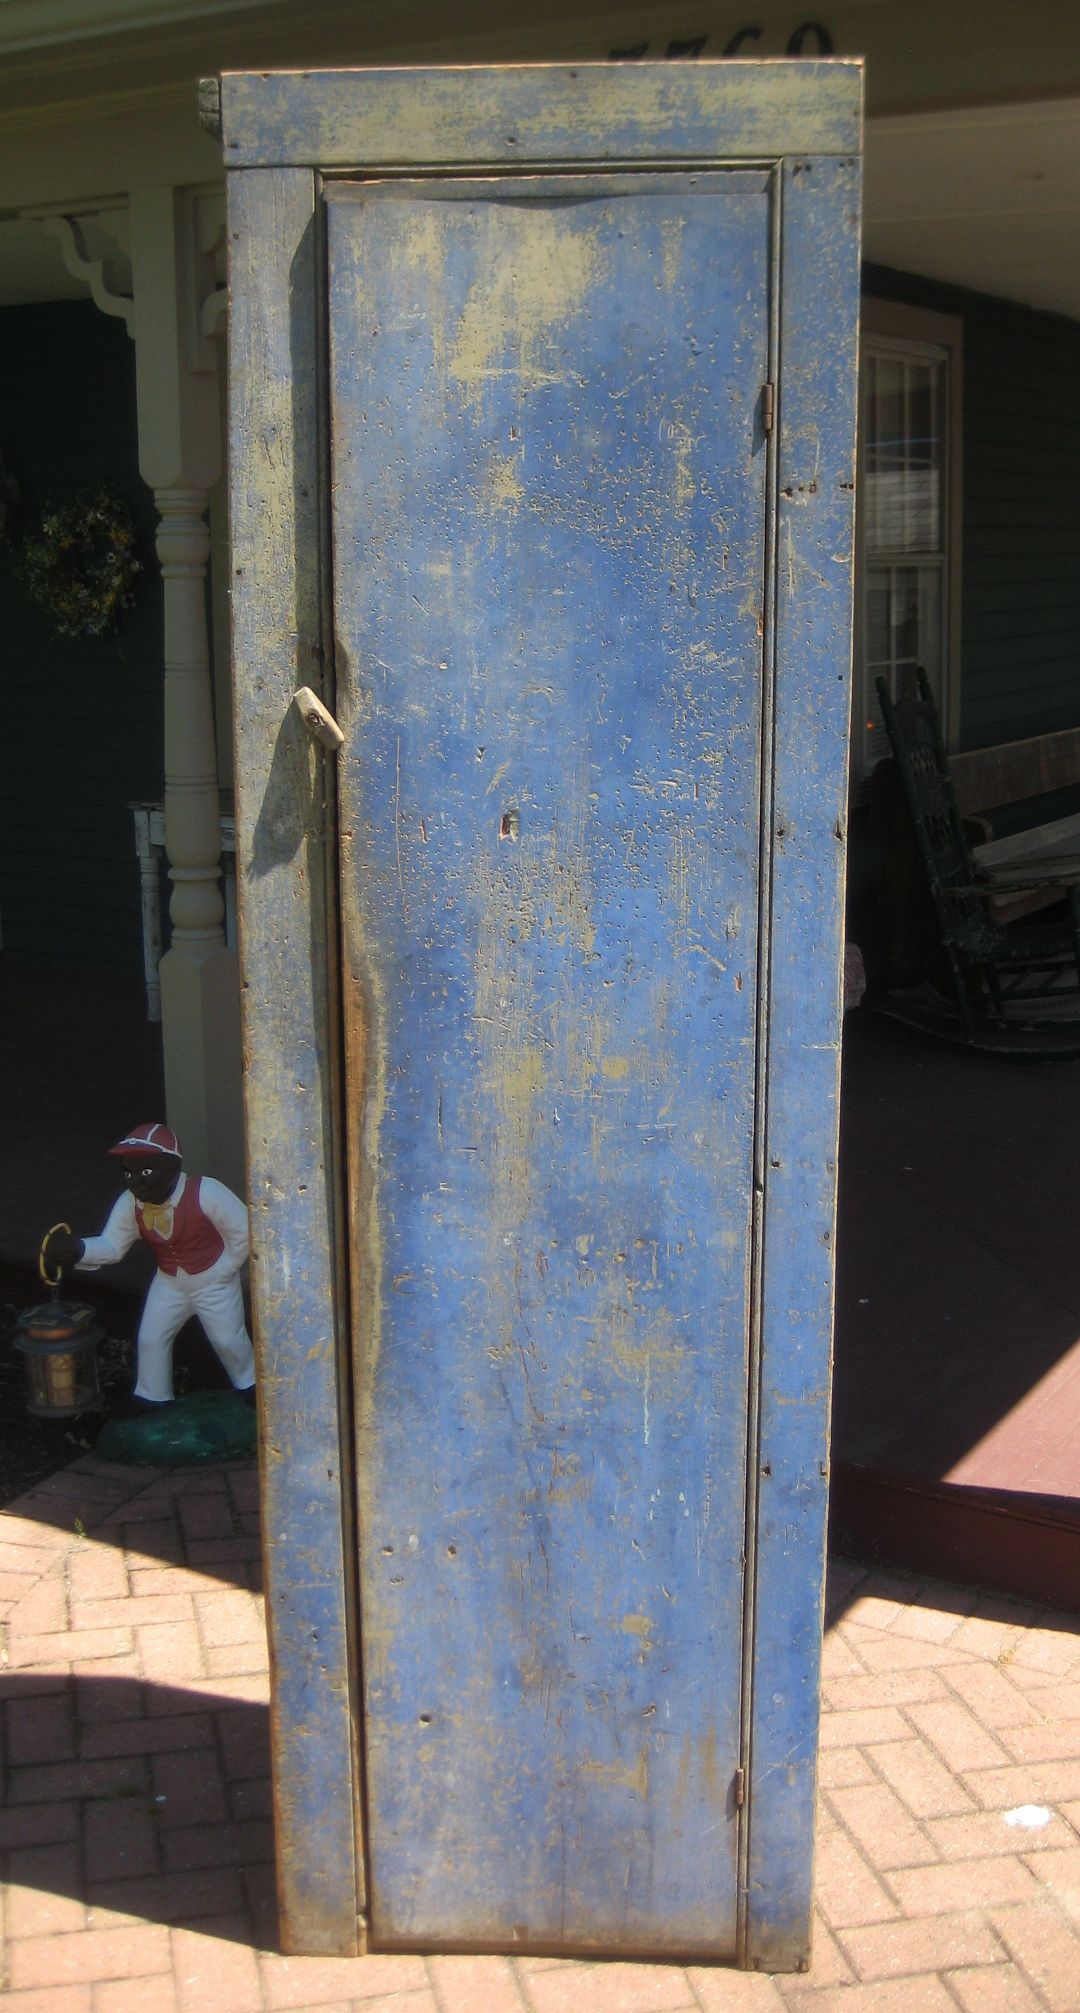 19th Century Chimney Cupboard - 19th Century Chimney Cupboard My Style Pinterest Cupboard